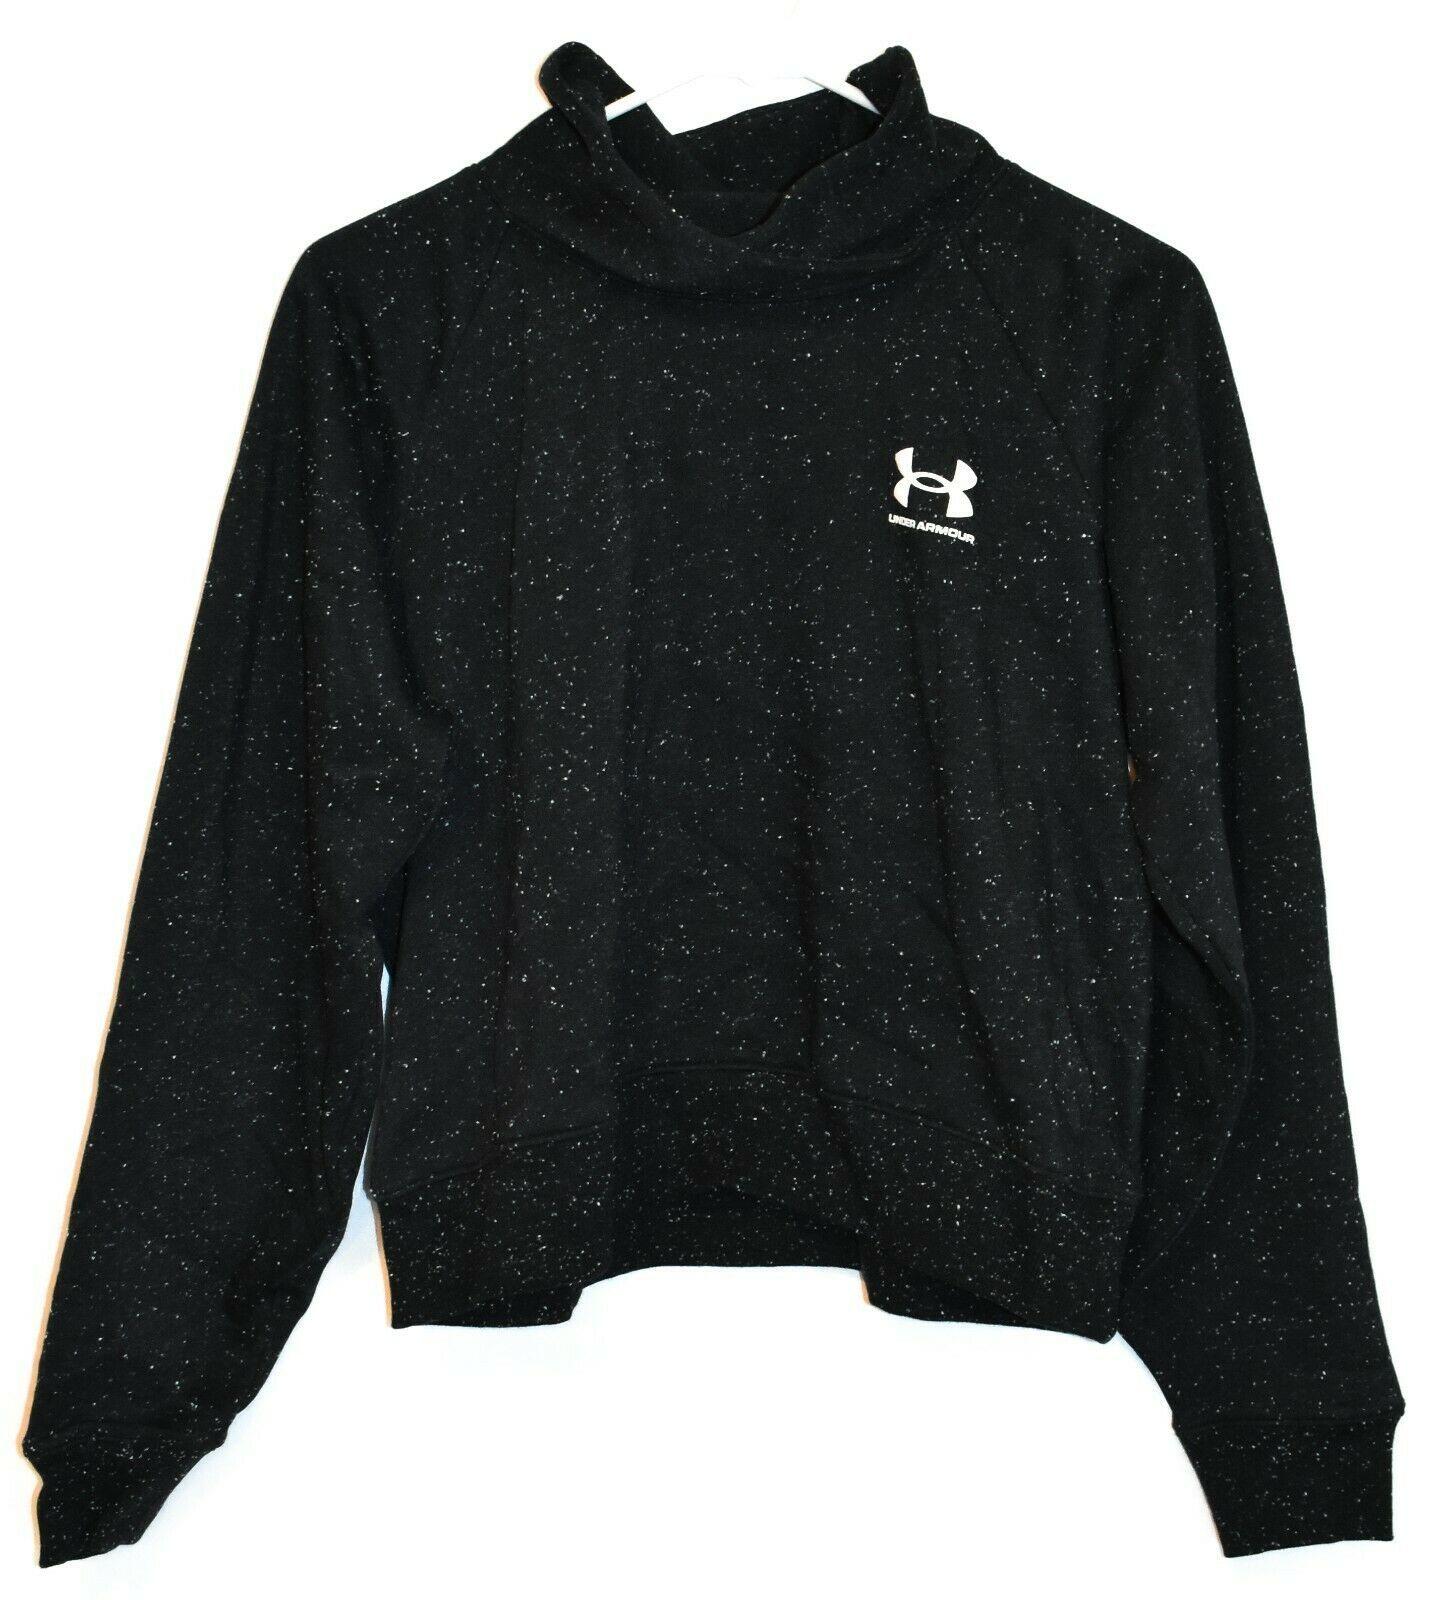 Under Armour Women's UA Black & White Rival Fleece Wrap Neck Sweatshirt Size S